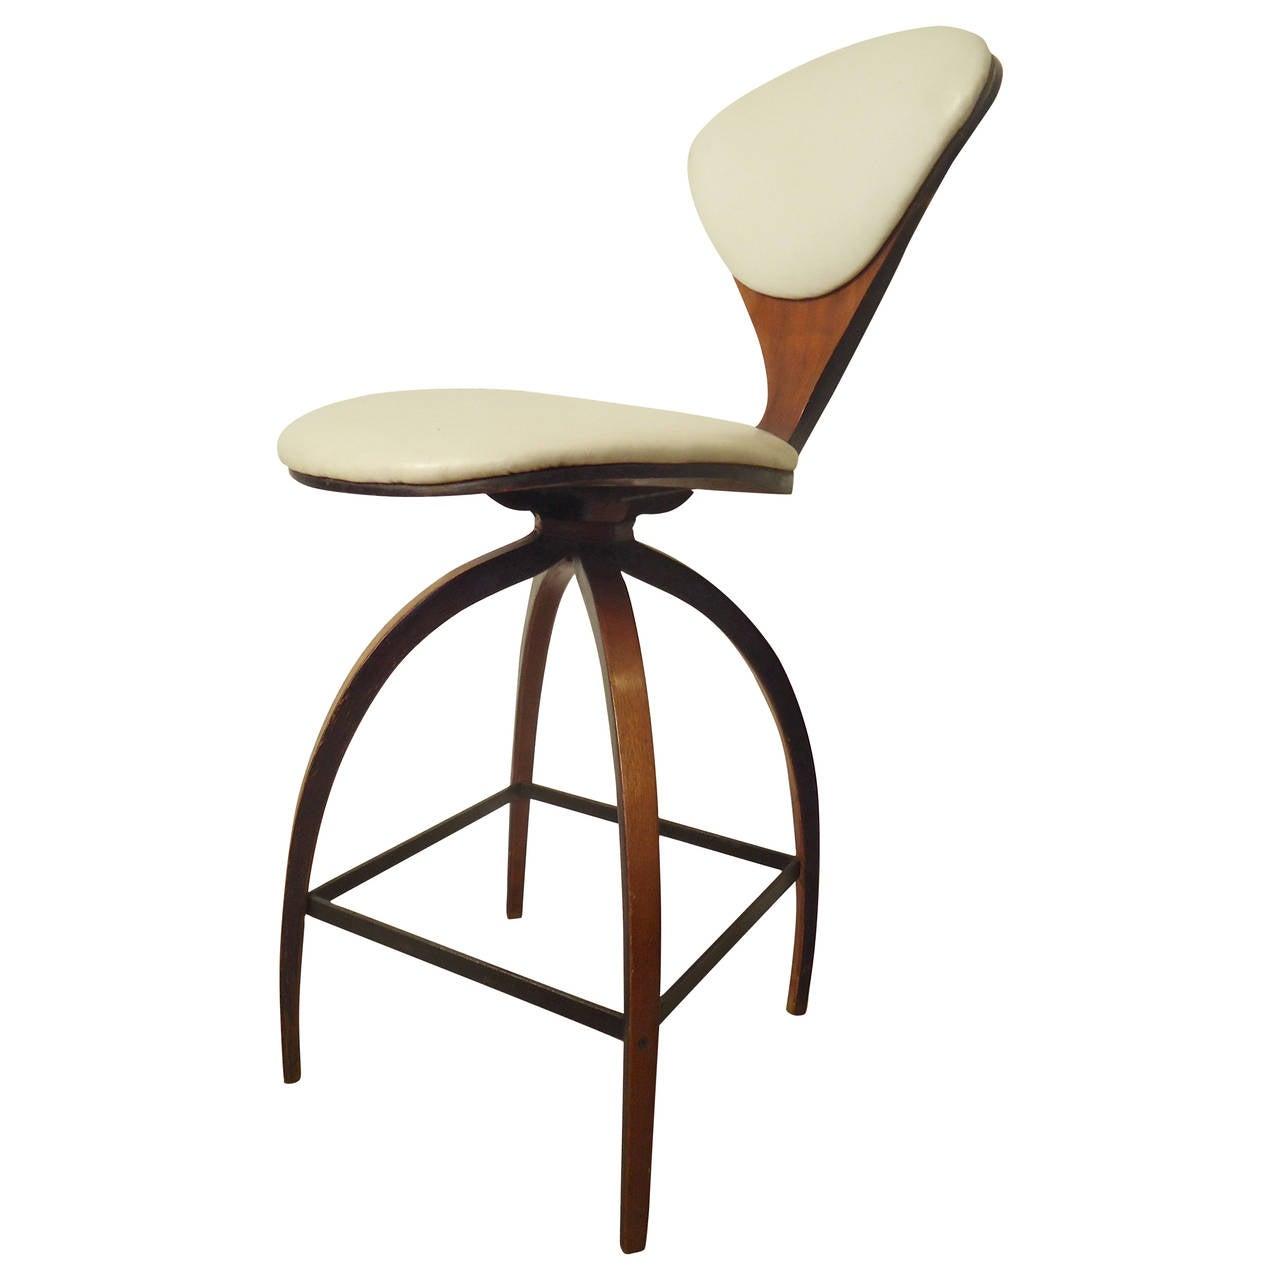 Norman cherner swivel stool at 1stdibs - Norman cherner barstool ...